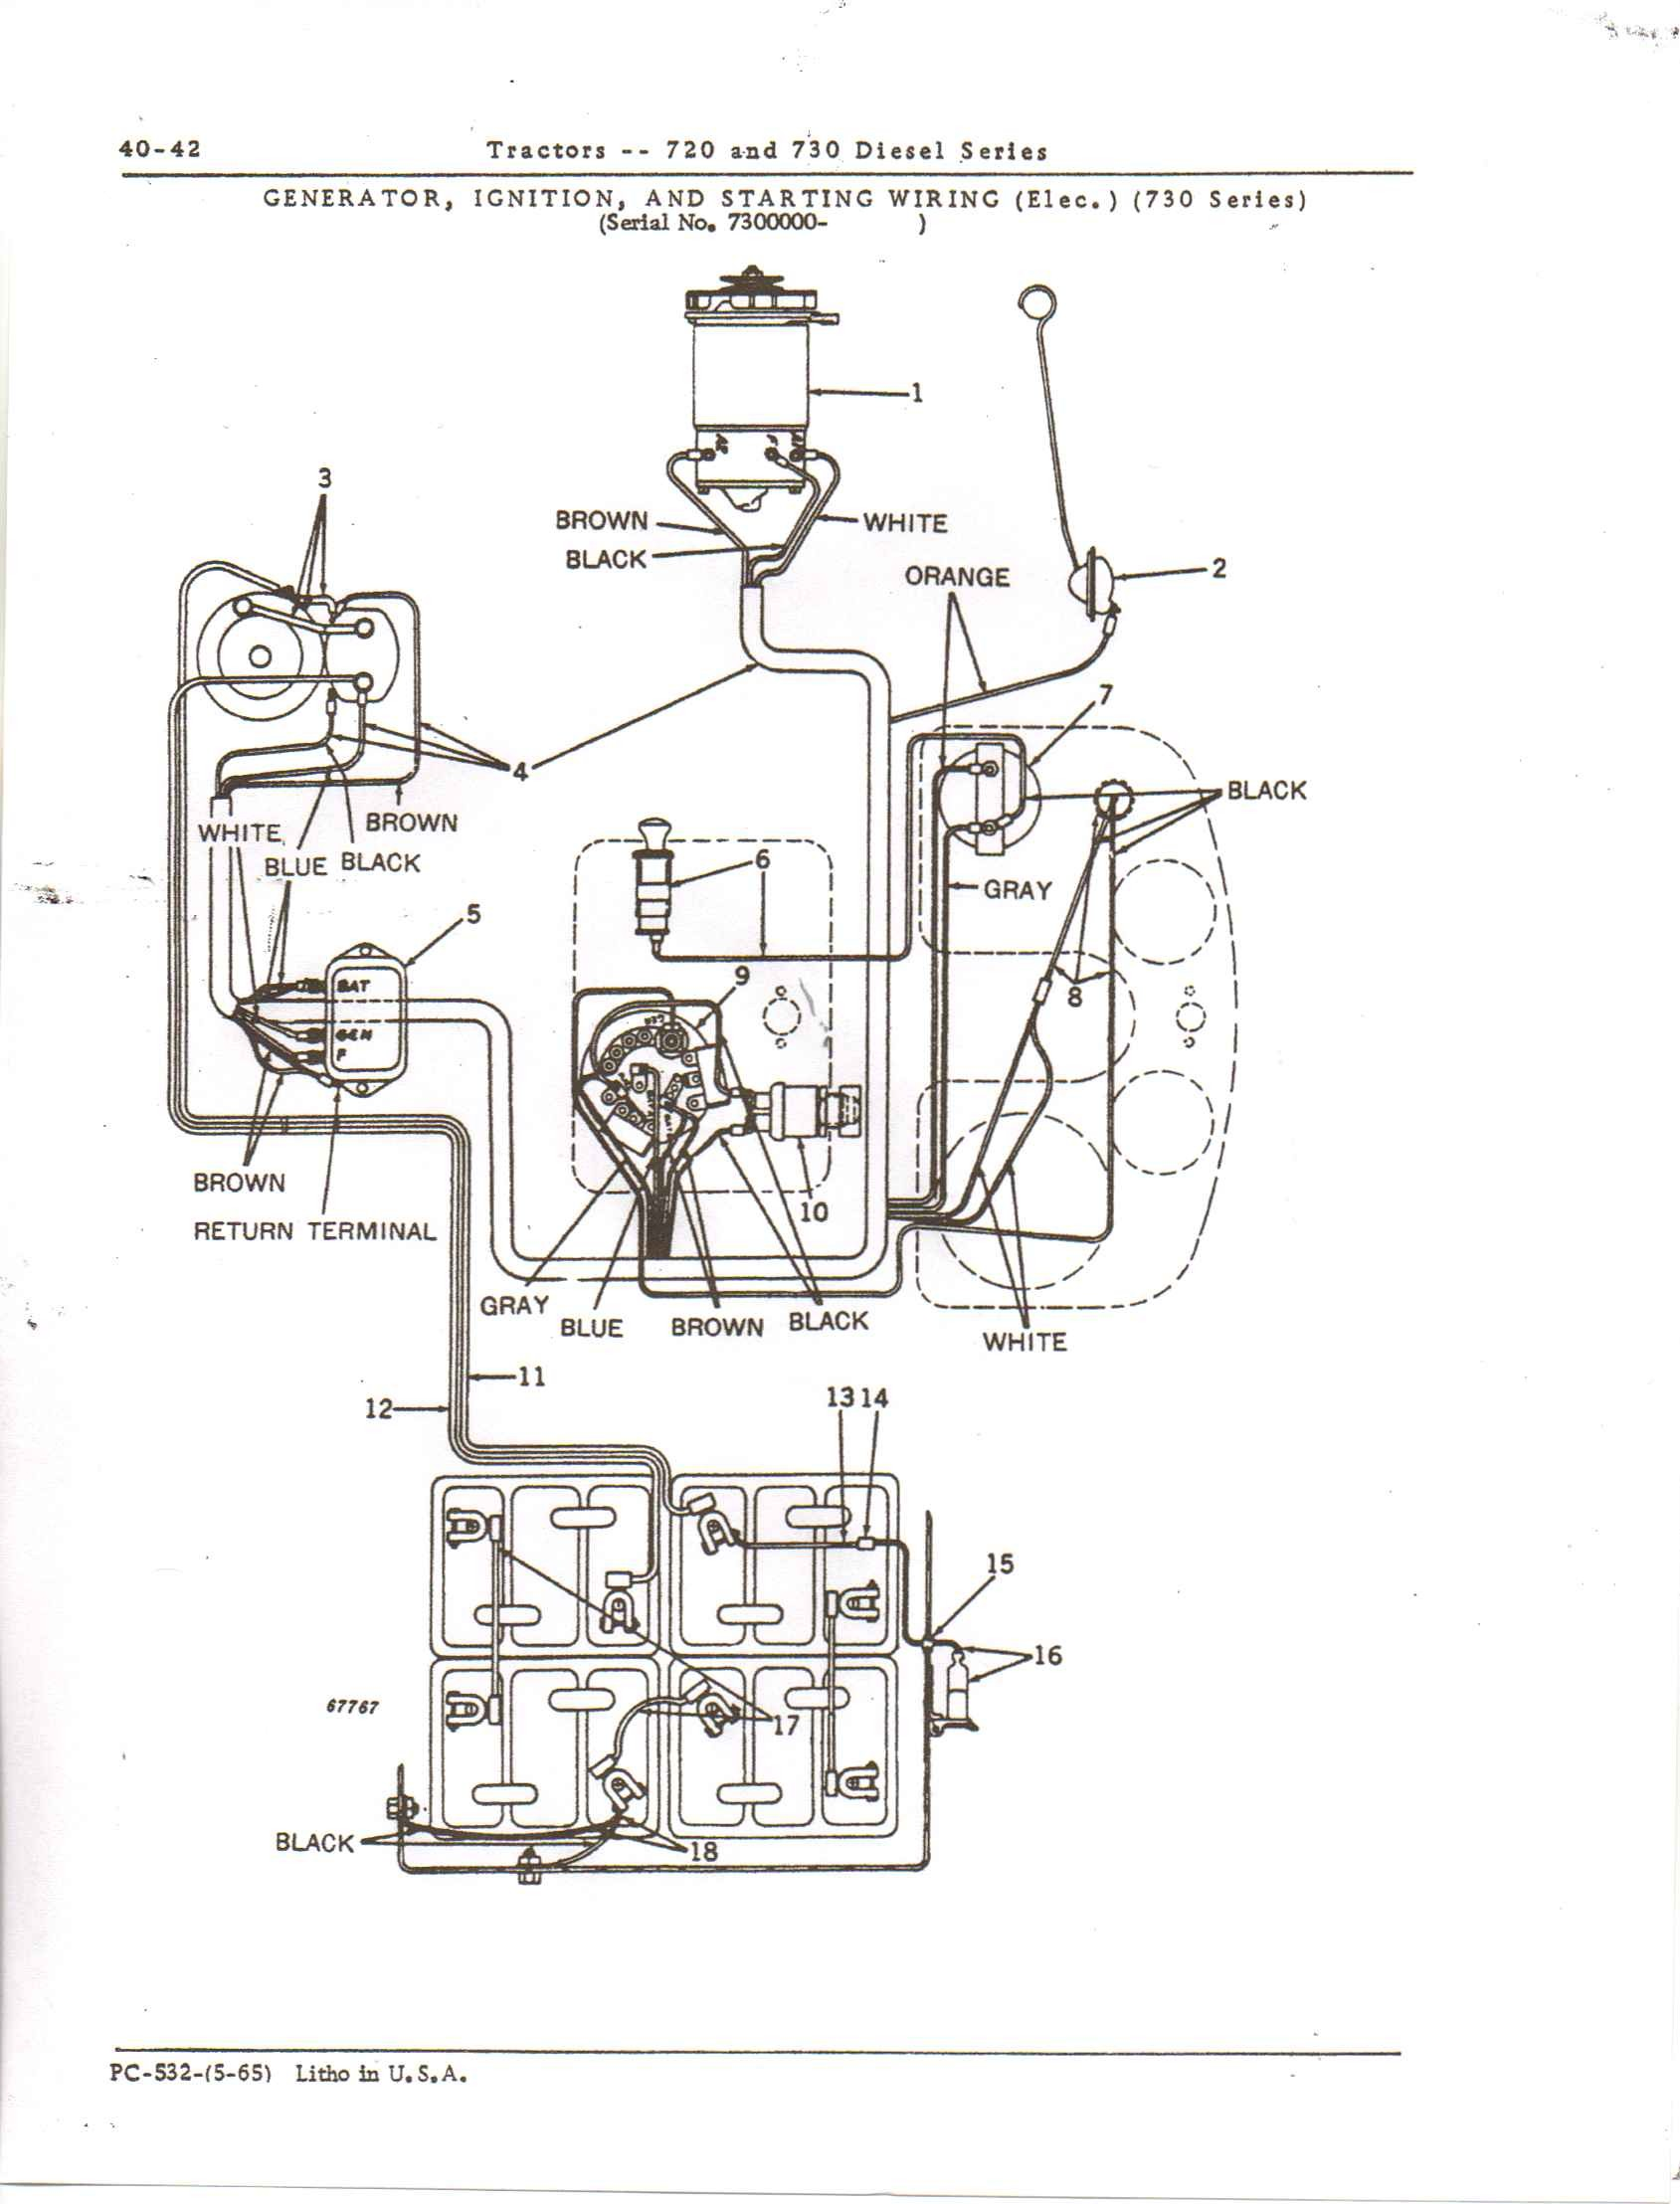 john deere 730 sel wiring diagram